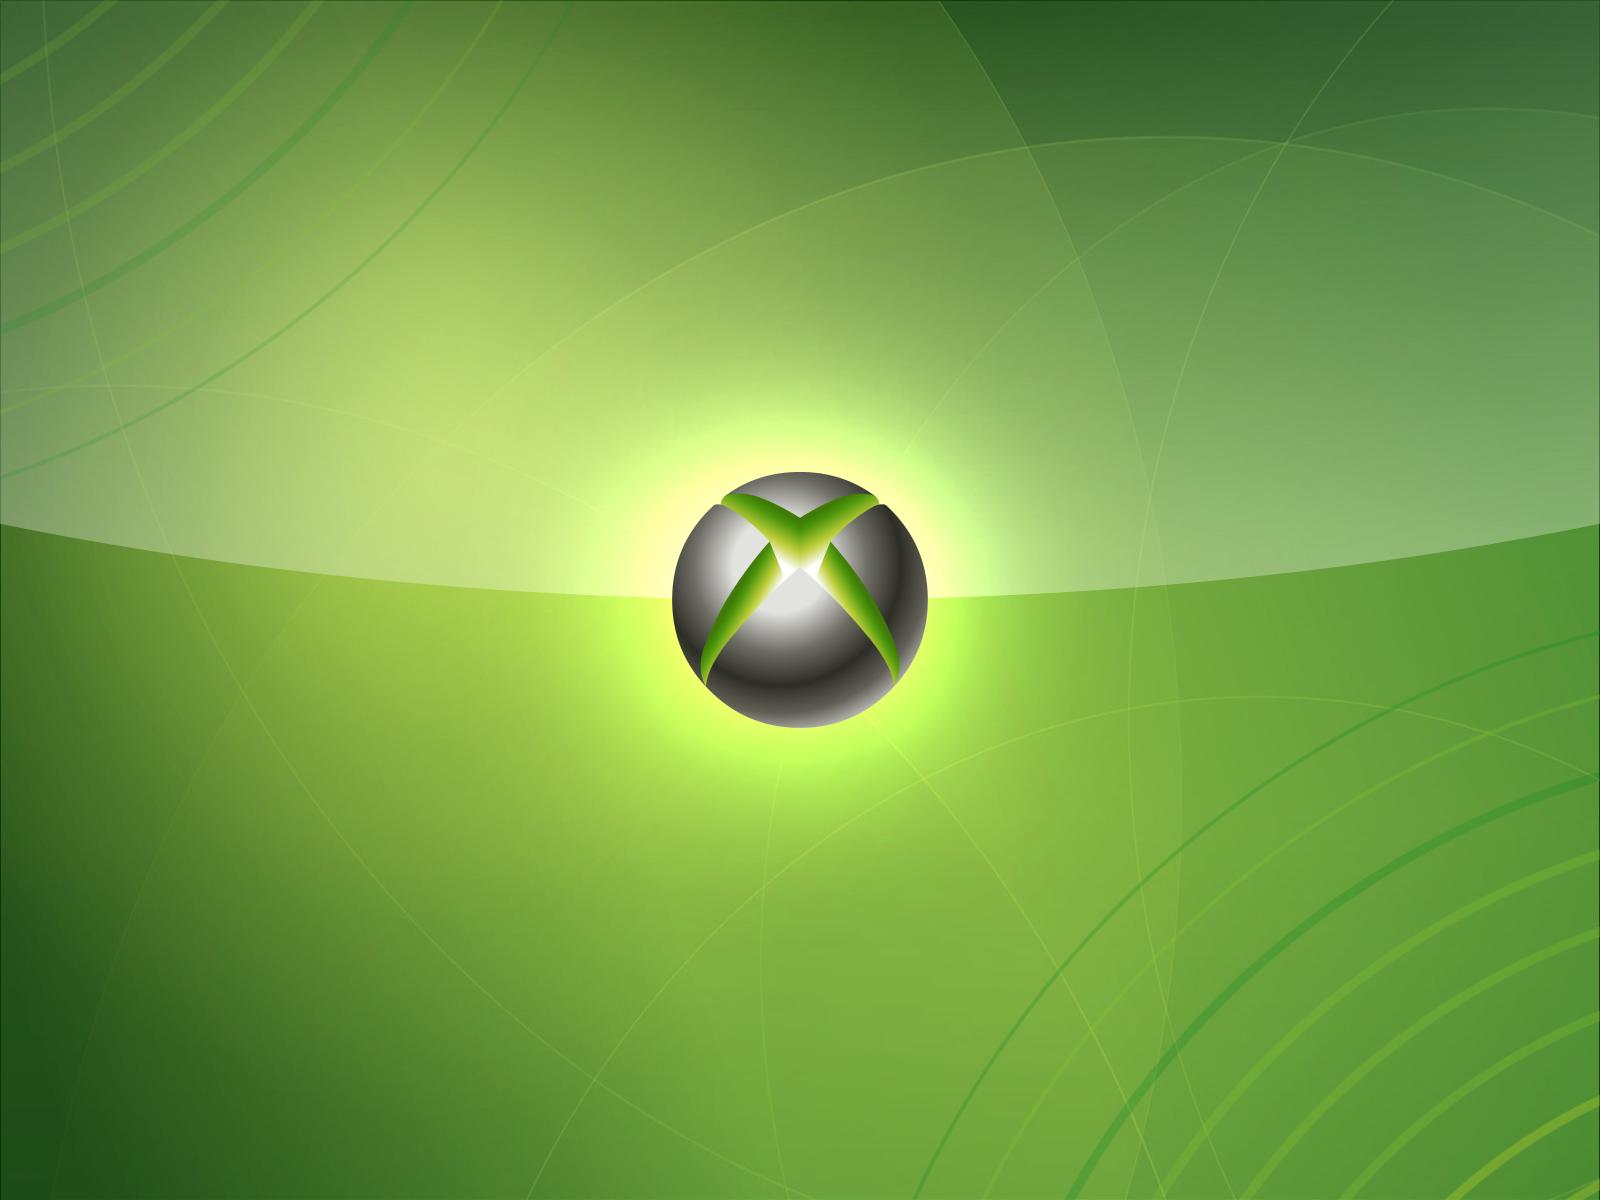 Xbox 360 Wallpaper